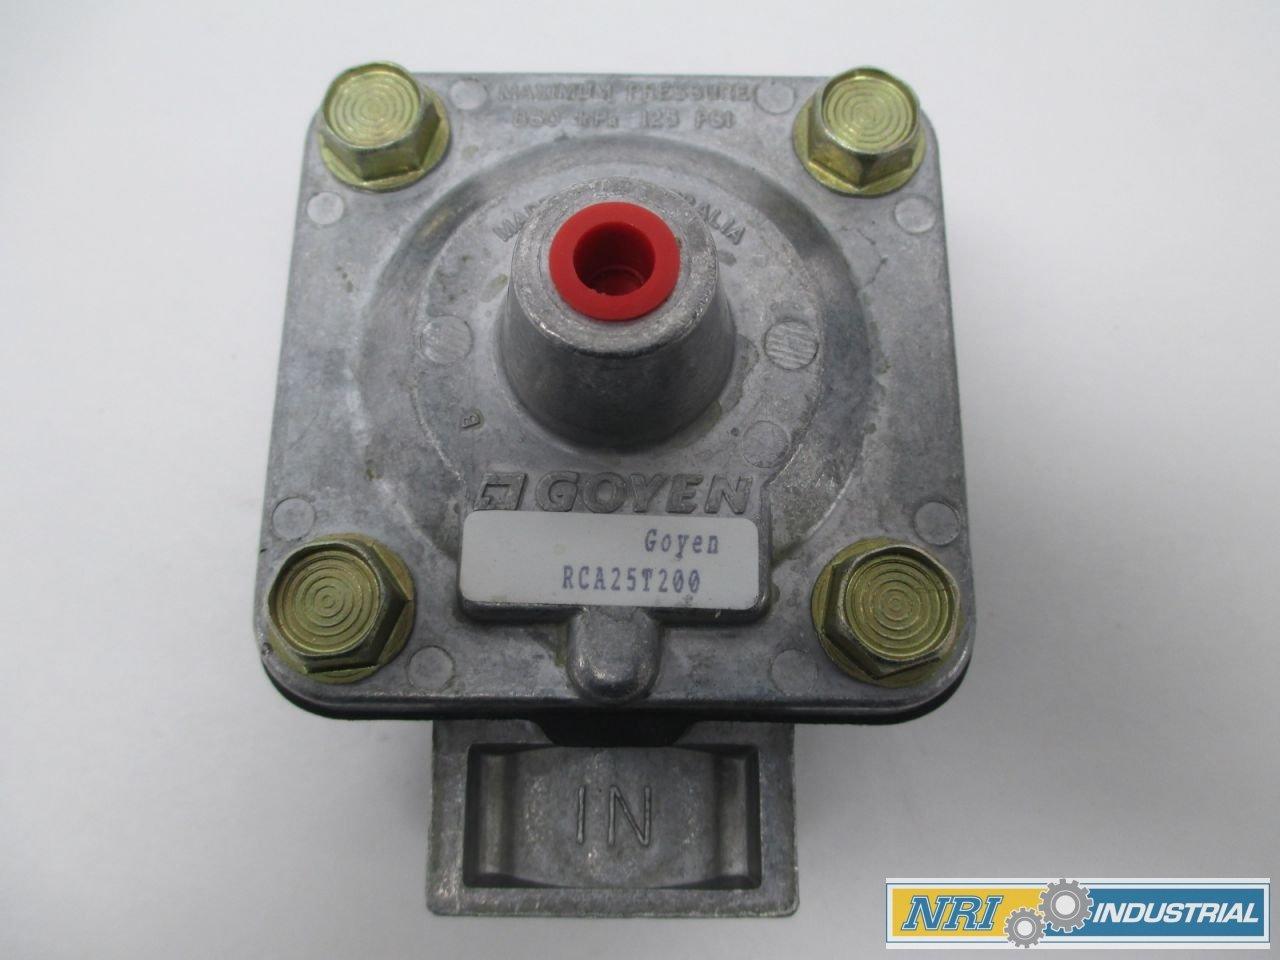 NEW GOYEN RCA25T200 125PSI THREADED 1IN NPT DIAPHRAGM VALVE D283375 by Goyen (Image #1)